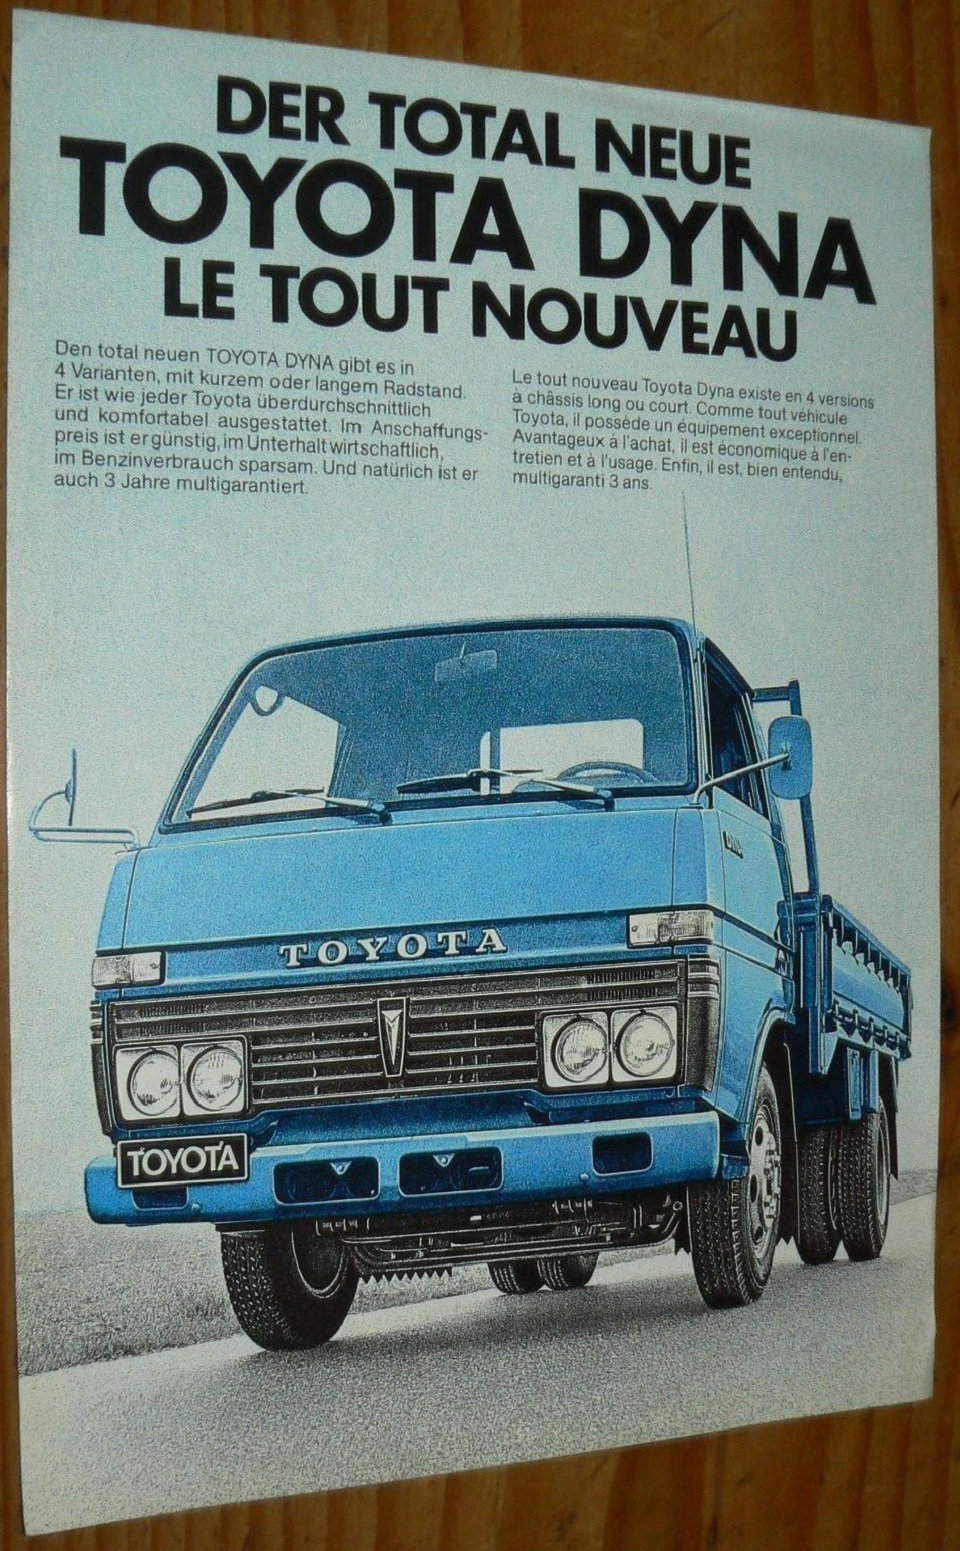 Toyota Dyna (aka Hino Ranger 2/Hino Ranger 3 and Daihatsu Delta, U20) #トヨタ・ダイナ/#ToyotaDyna/#日野・レンジャー2/#HinoRanger2/#日野・レンジャー3/#HinoRanger3/#ダイハツ・デルタ/#DaihatsuDelta #Japaneselorries (Japanese #lorries). Cars of #Toyota/#Lexus/#Subaru/[#Maruti] #Suzuki #MarutiSuzuki/#Mazda/Mitsubishi Motors #MitsubishiMotors/#Isuzu #JDM #UKDM/#AUDM/#NZDM, #Japanese cars #Japanesecars #V6engines #boxerengines #£ #FuckKorea #YesJapan #特亜人 #Chinazi #Koreanazi #キムチ野郎 #FuckChina #FuckRussia #FuckCOVID19 #ブレグジット/#Brexit